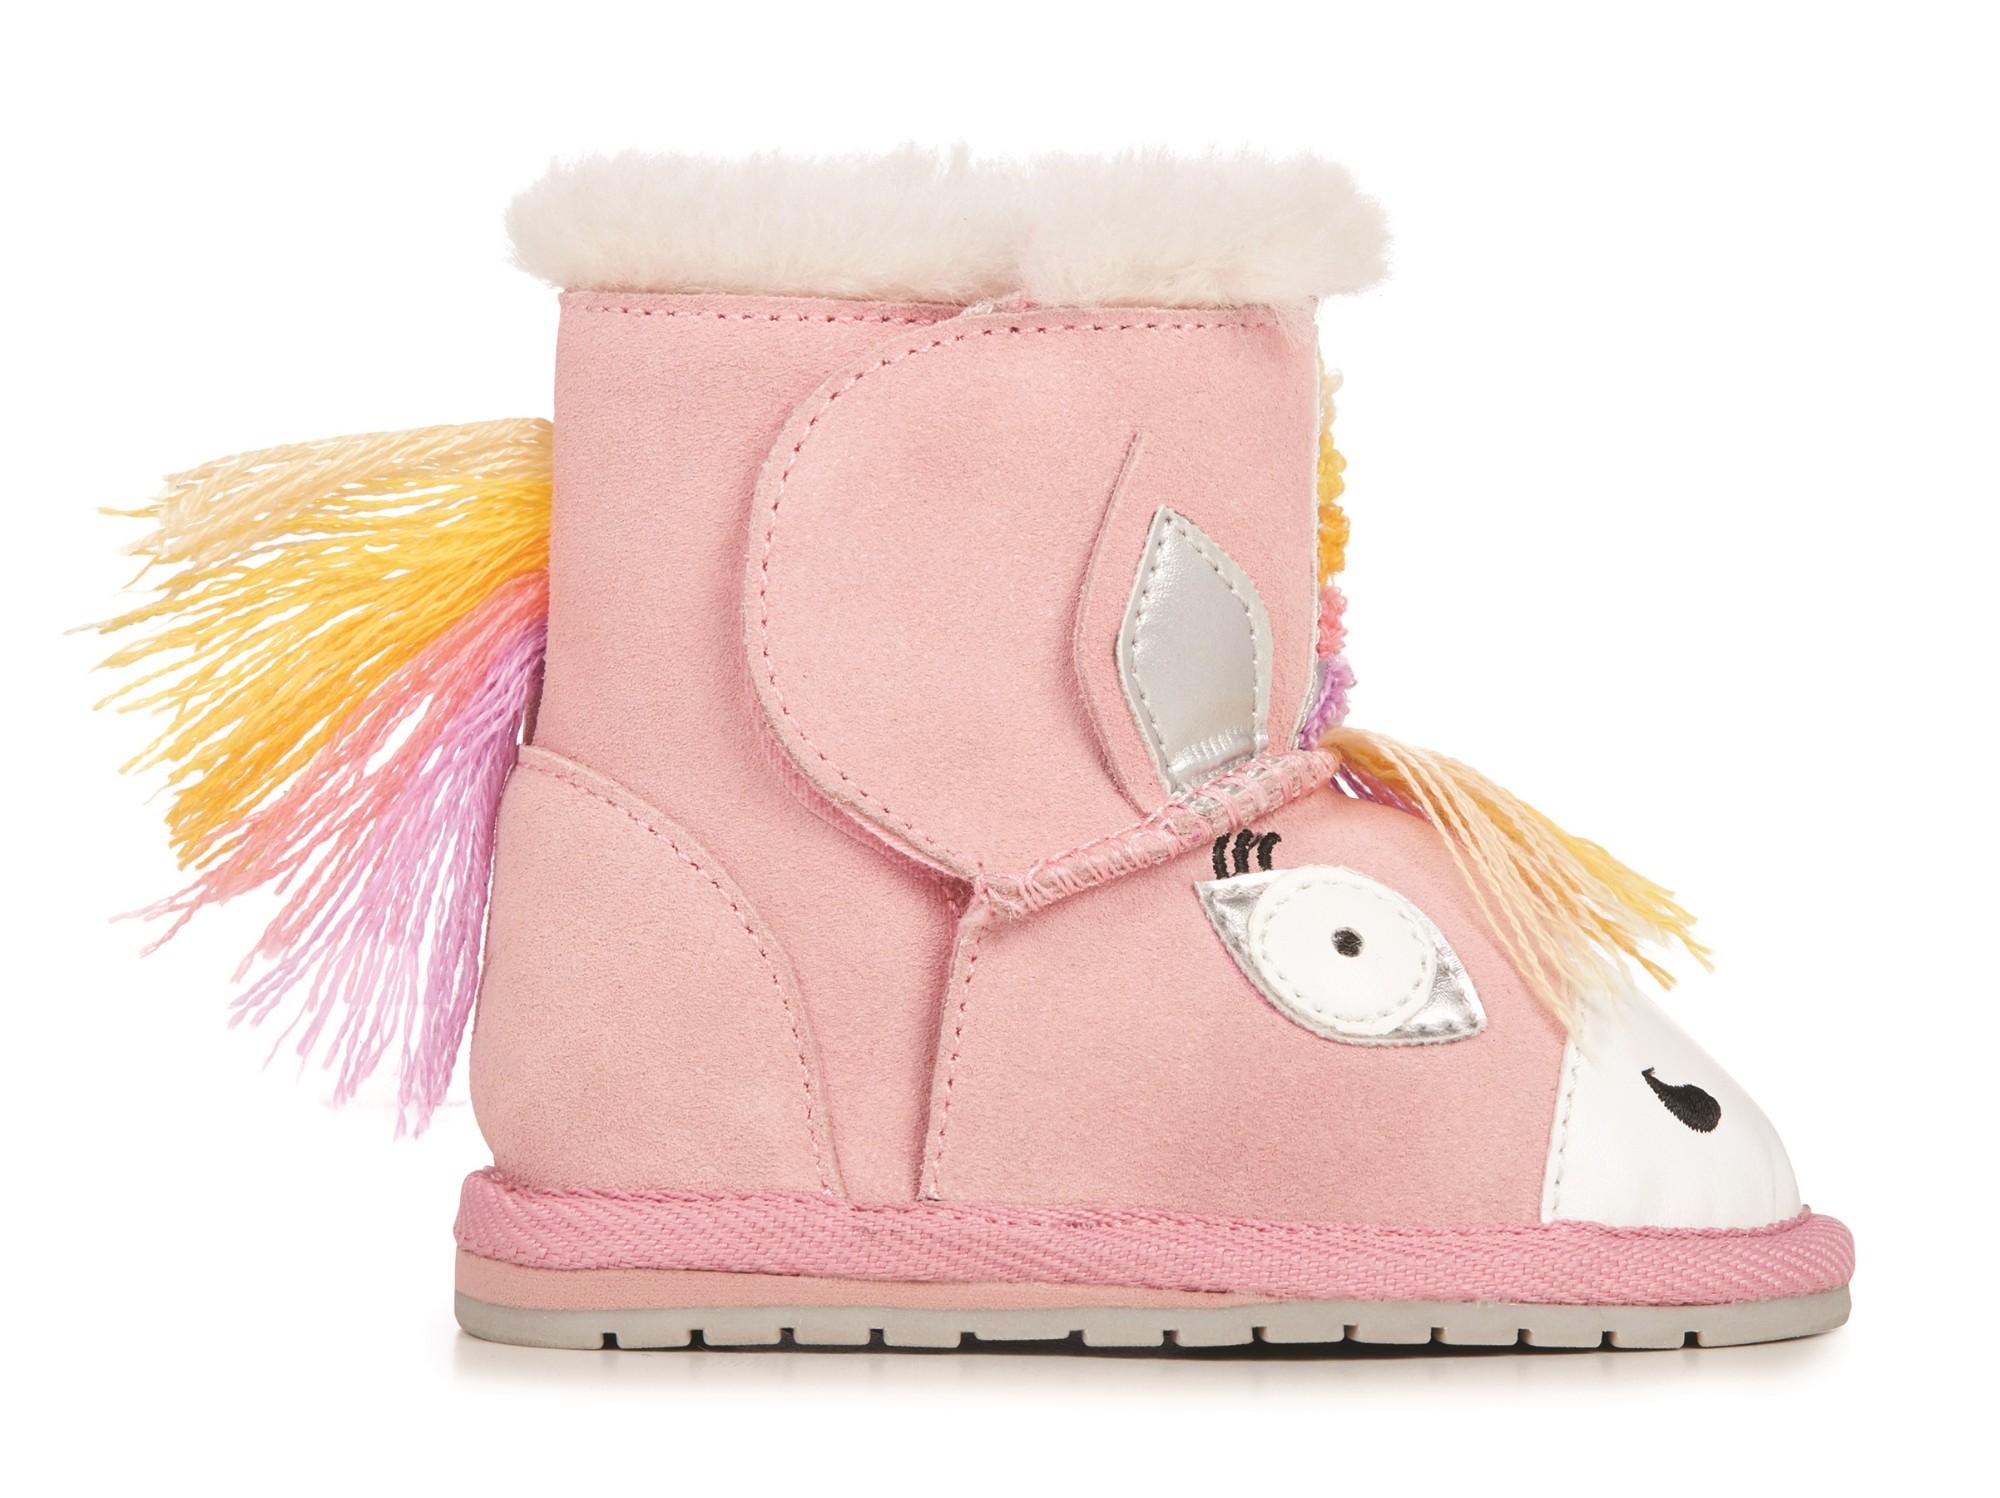 EMU Australia Magical Unicorn Walker Pale Pink 18M+